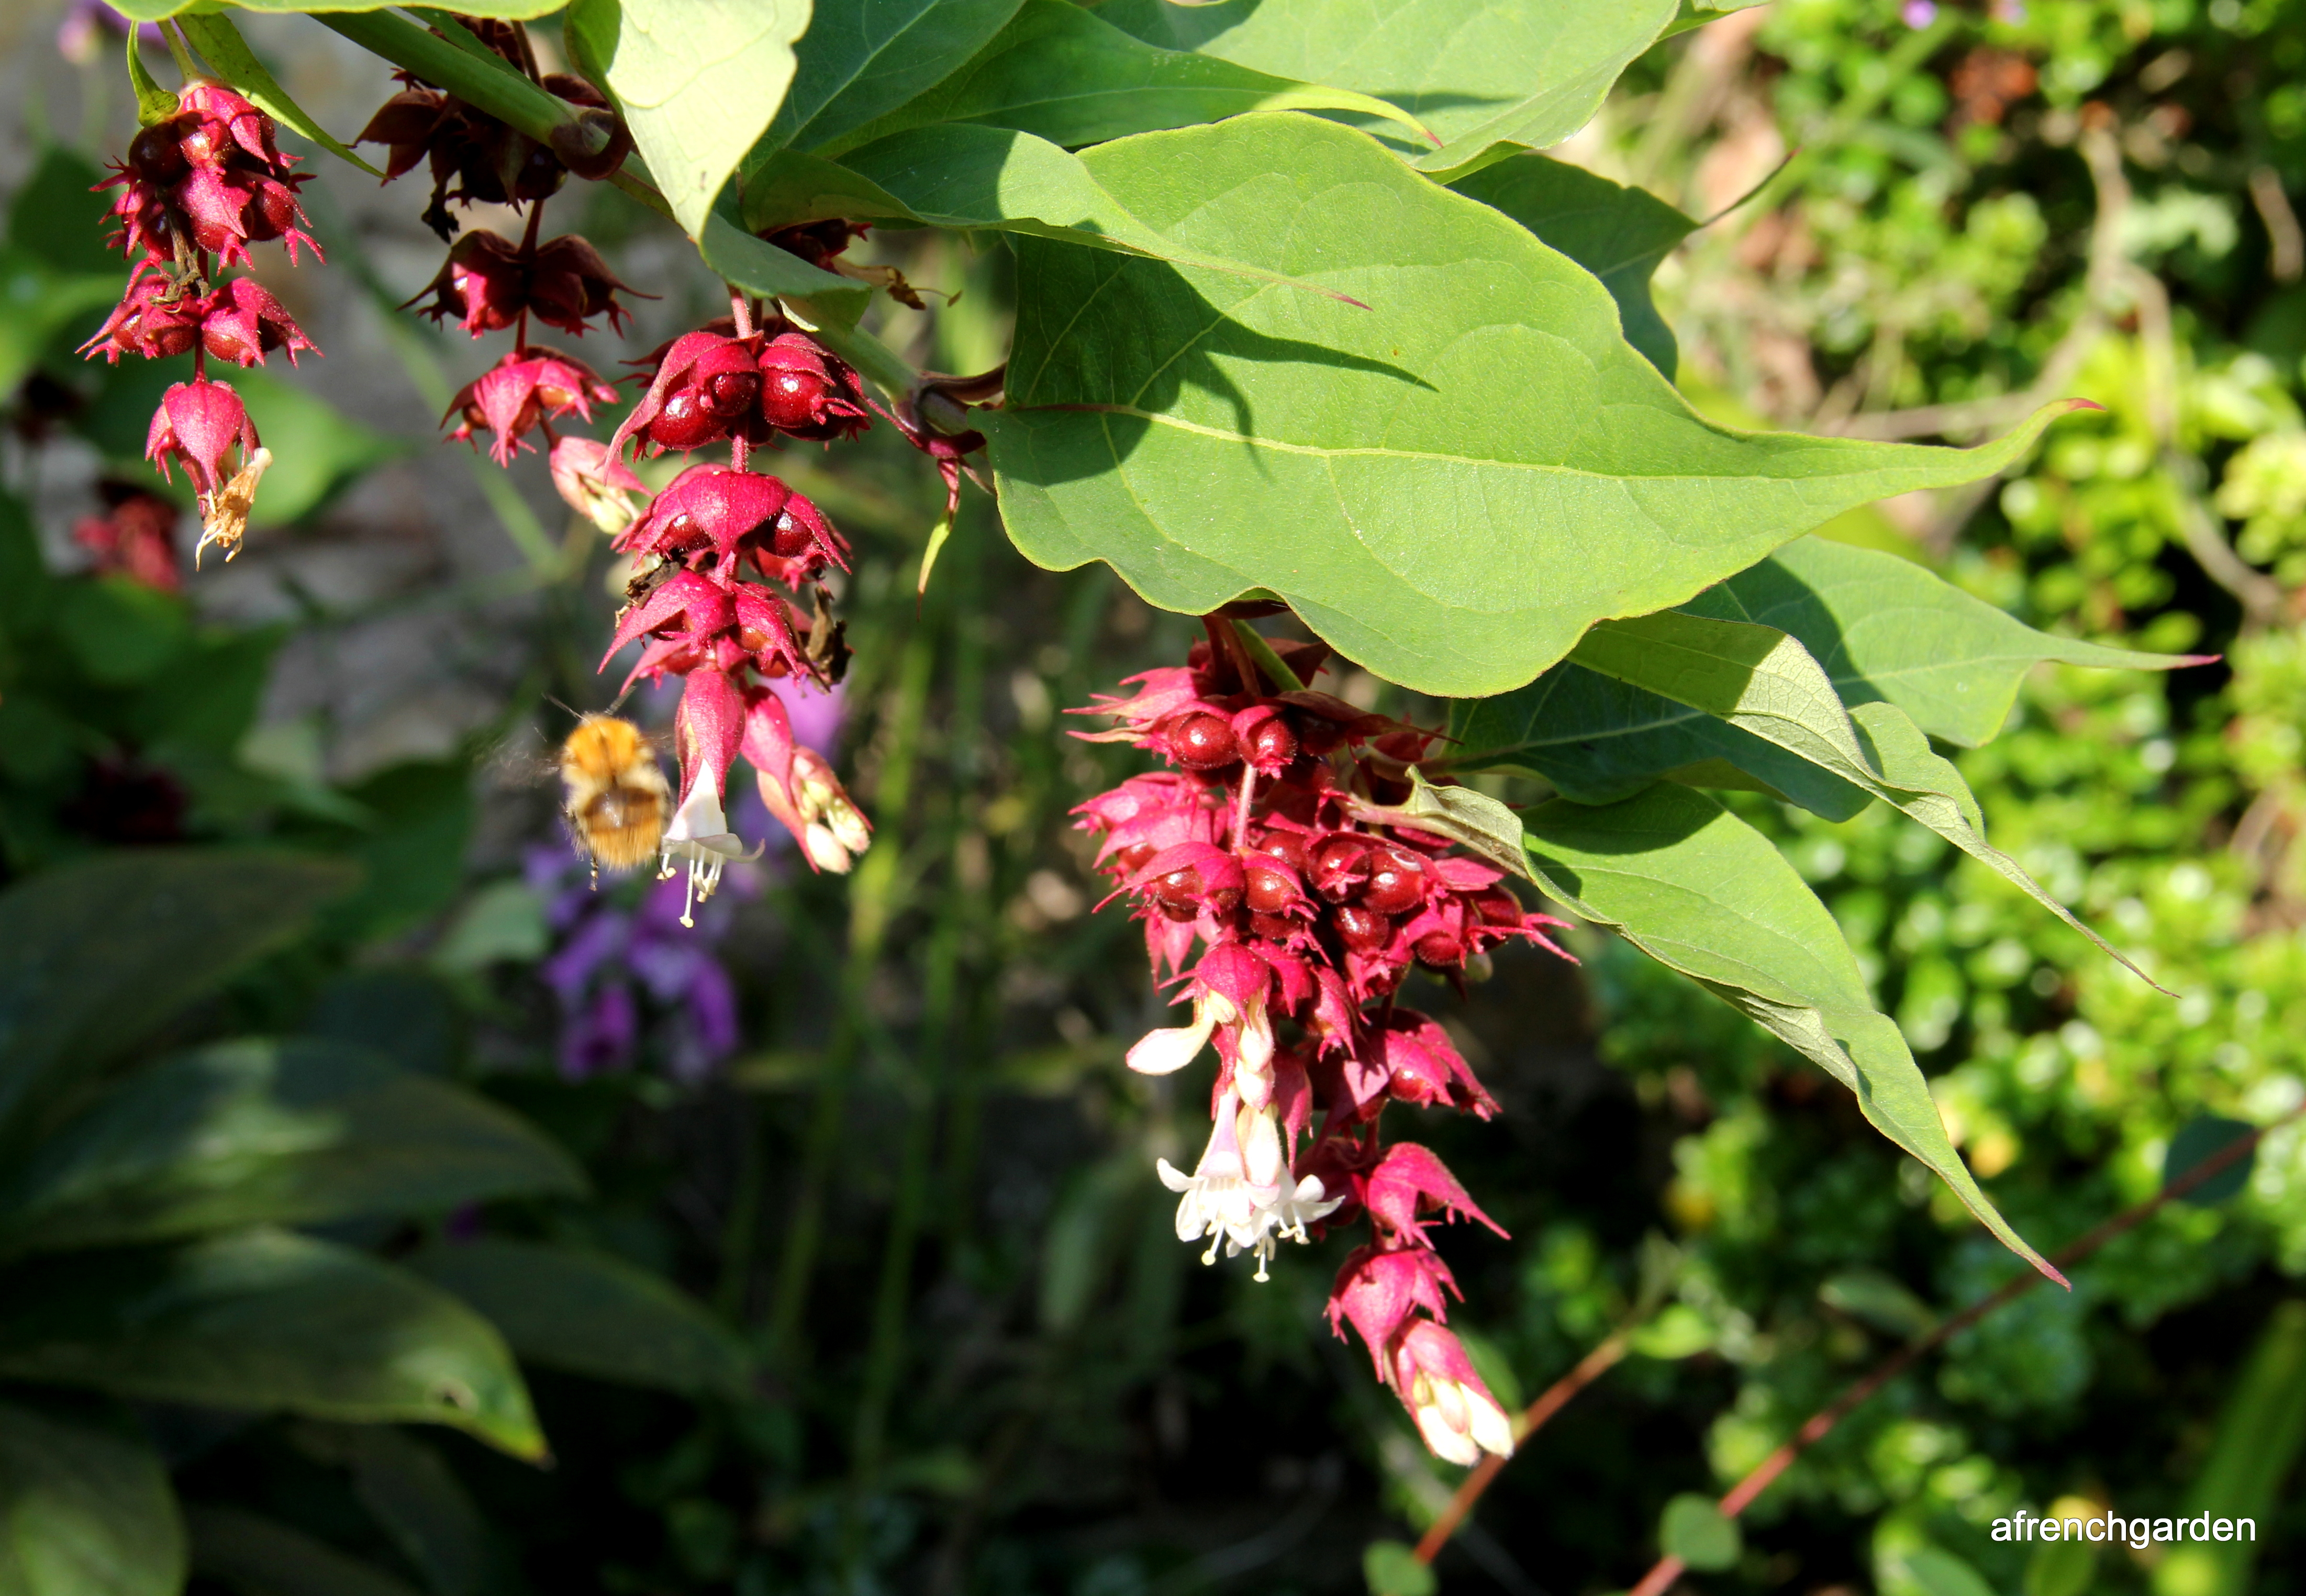 1-Himalayan honeysuckle (Leycesteria formosa) close